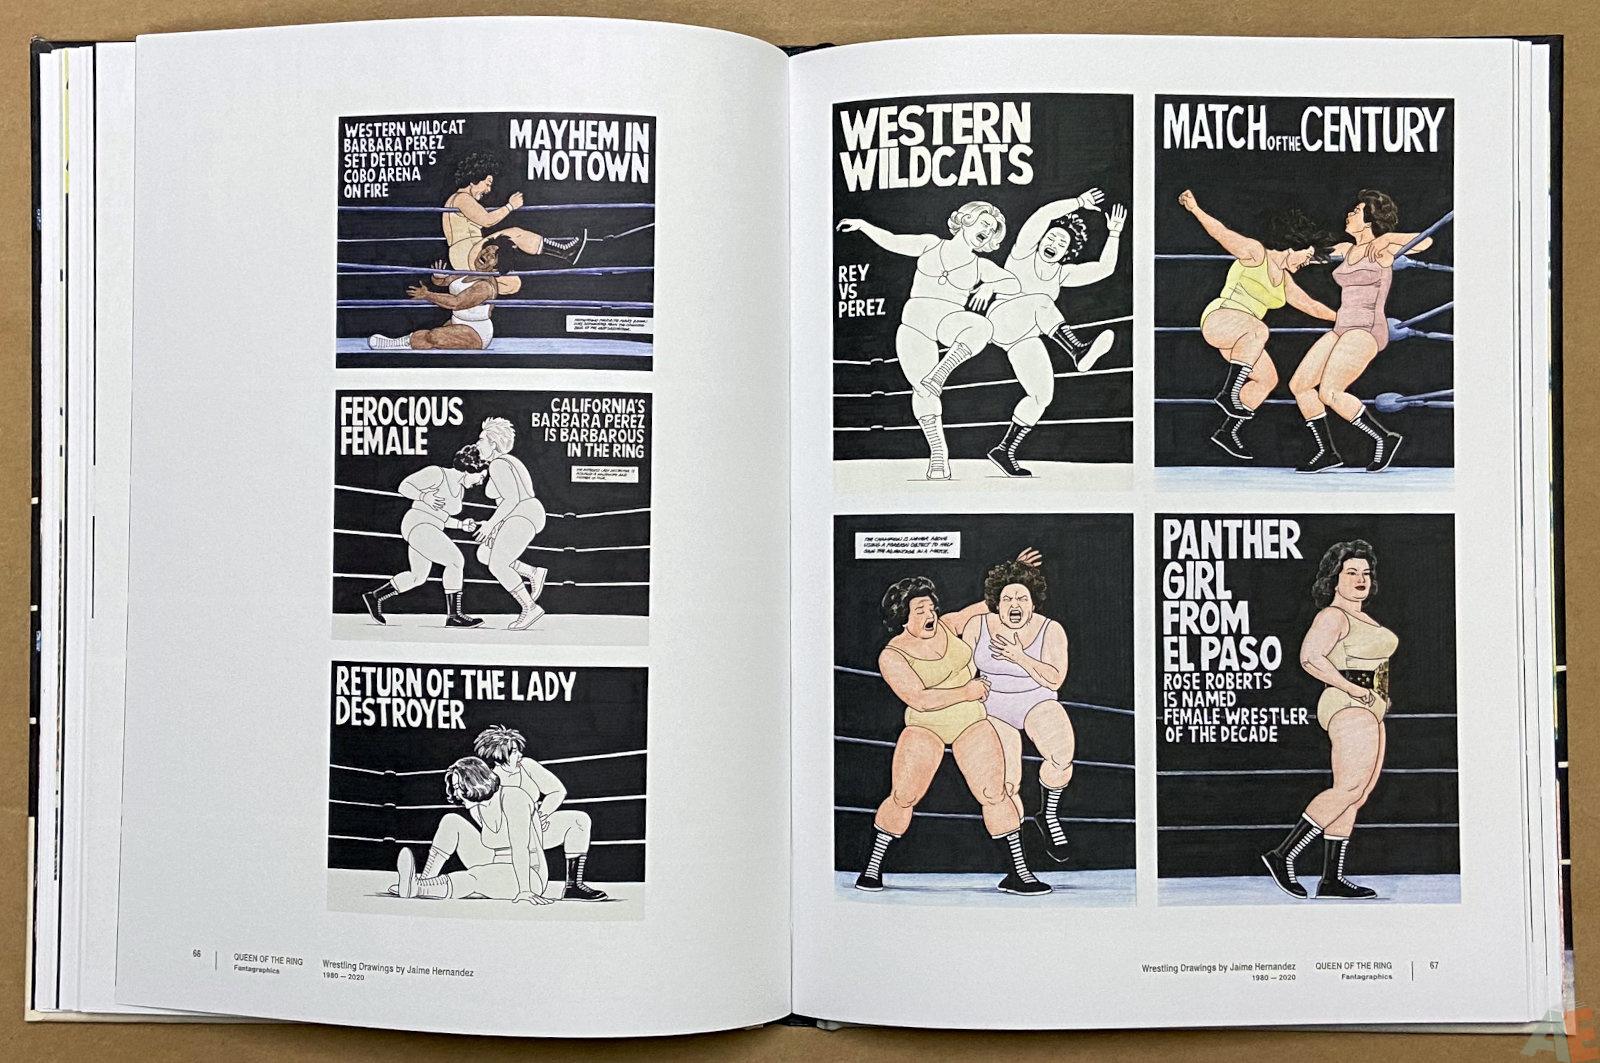 Queen of the Ring Wrestling Drawings by Jaime Hernandez 1980 2020 interior 8